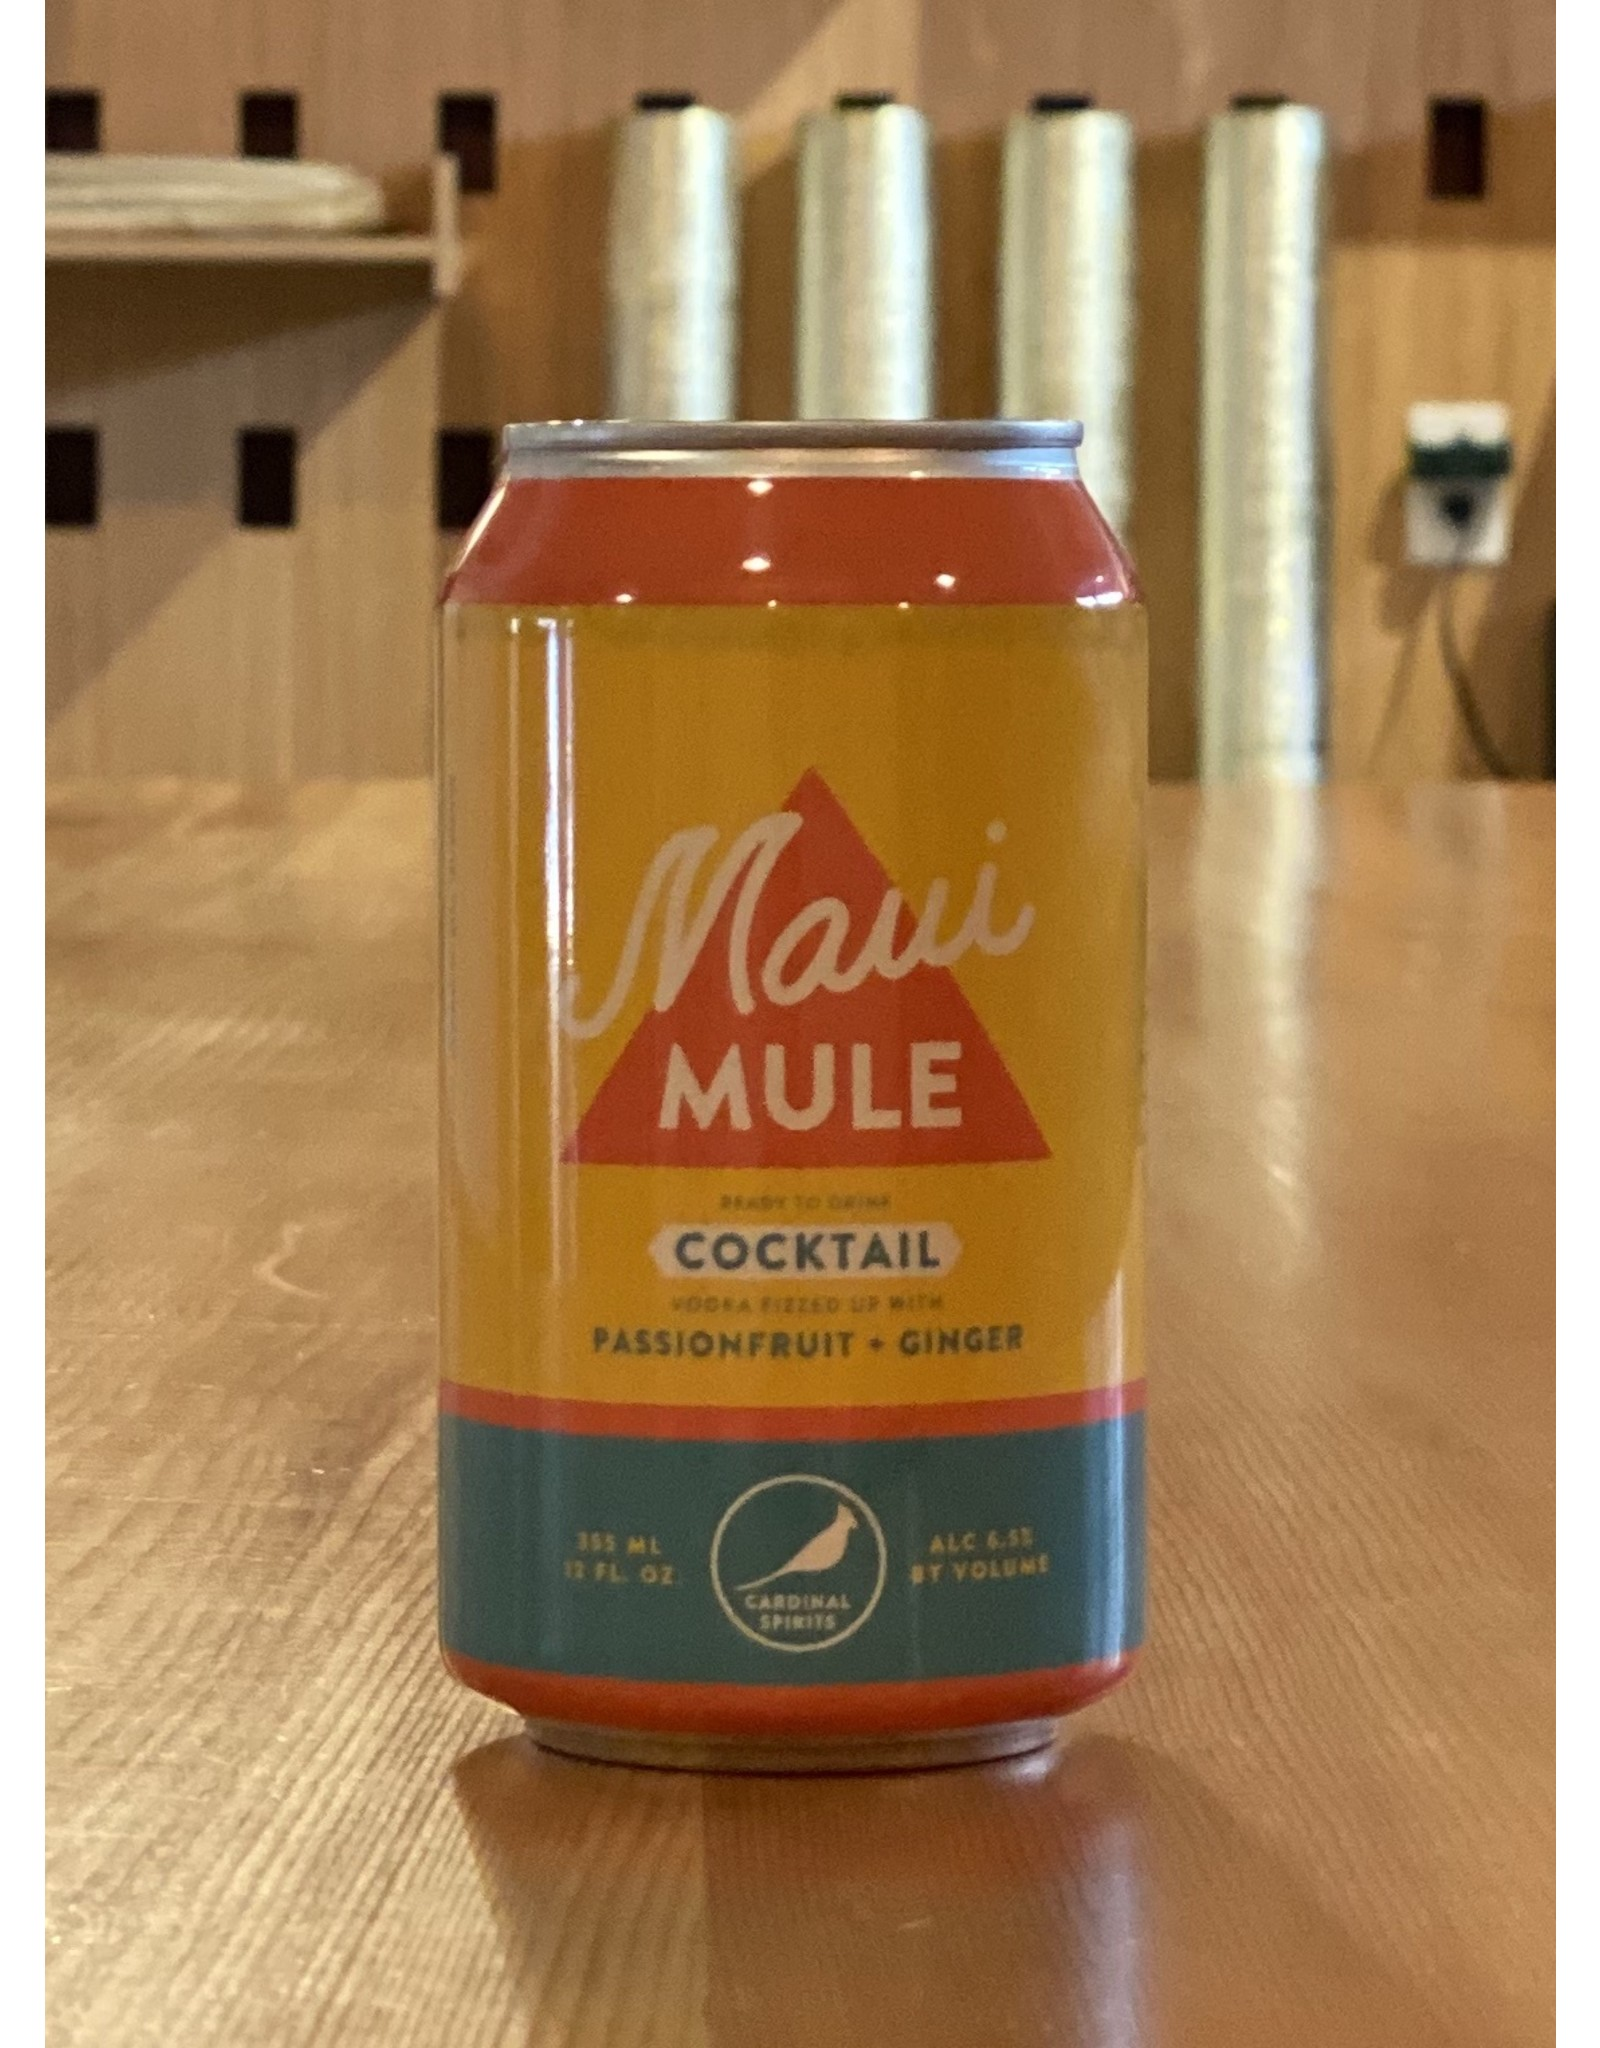 RTD Cardinal Spirits ''Maui Mule'' RTD Cocktail